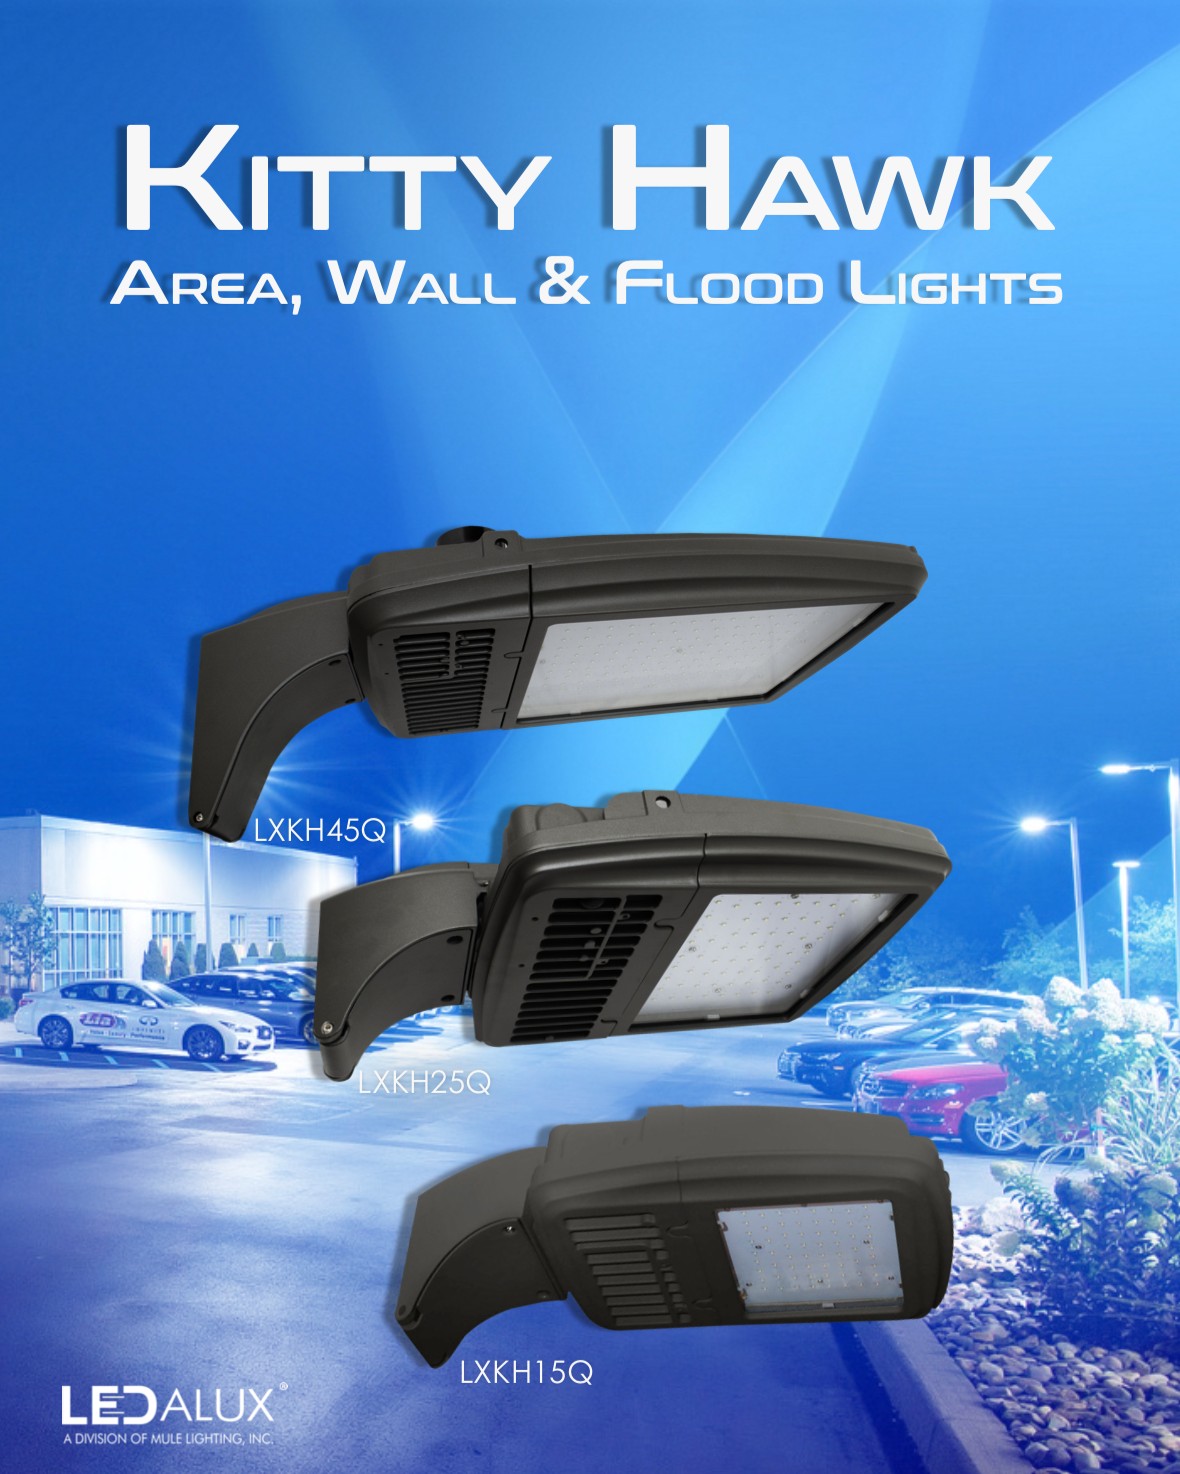 LEDalux Kitty Hawk Area, Wall & Flood Lights Literature